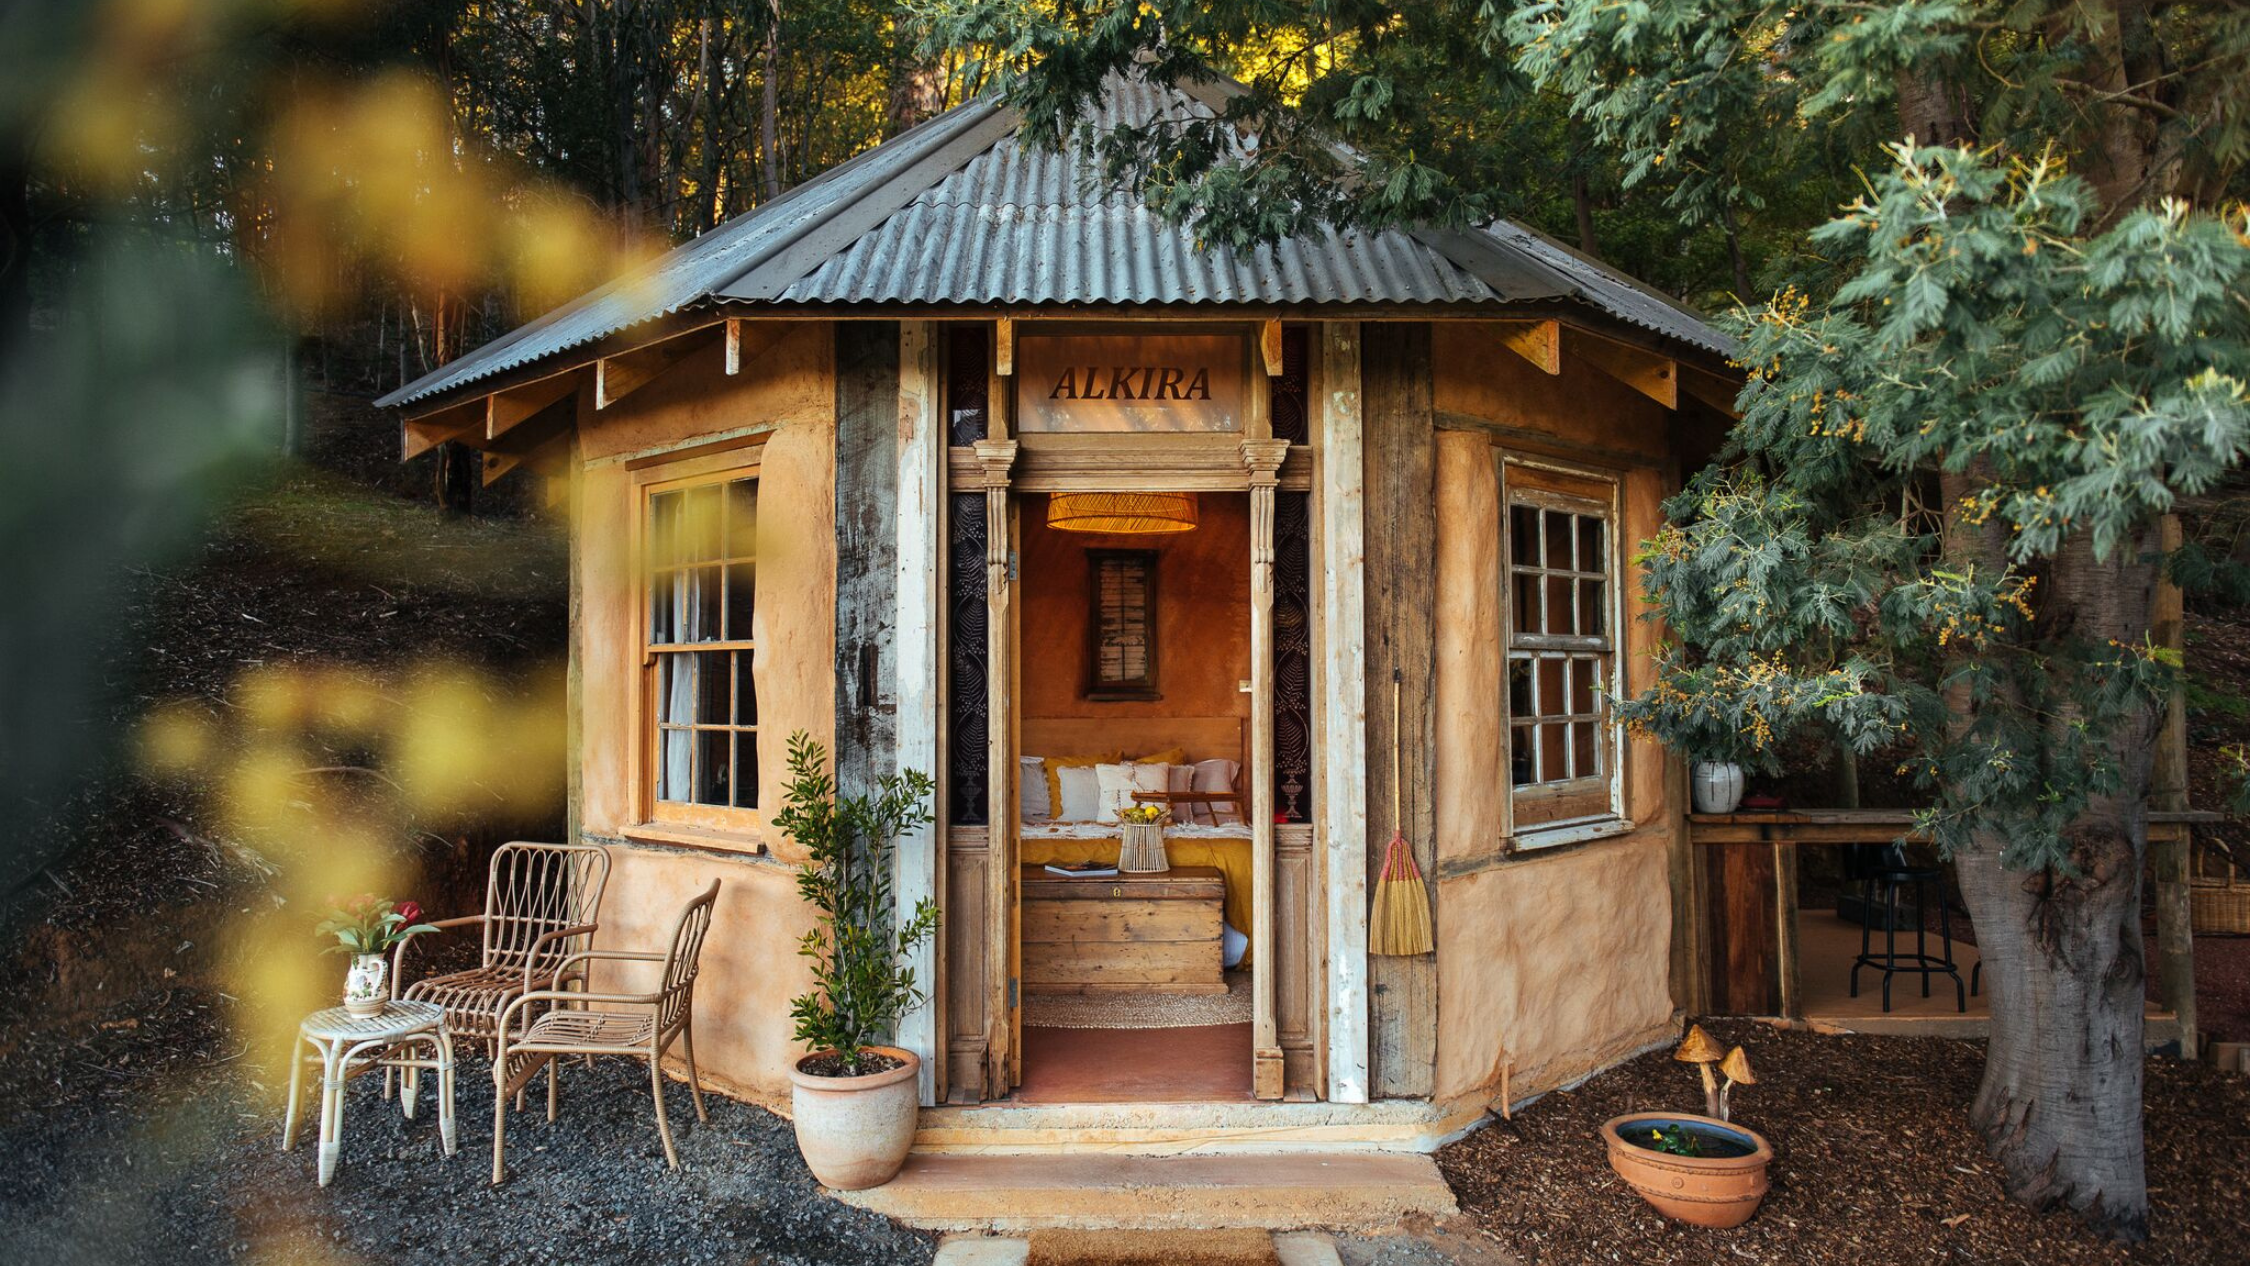 Alkira eco-glamping hut